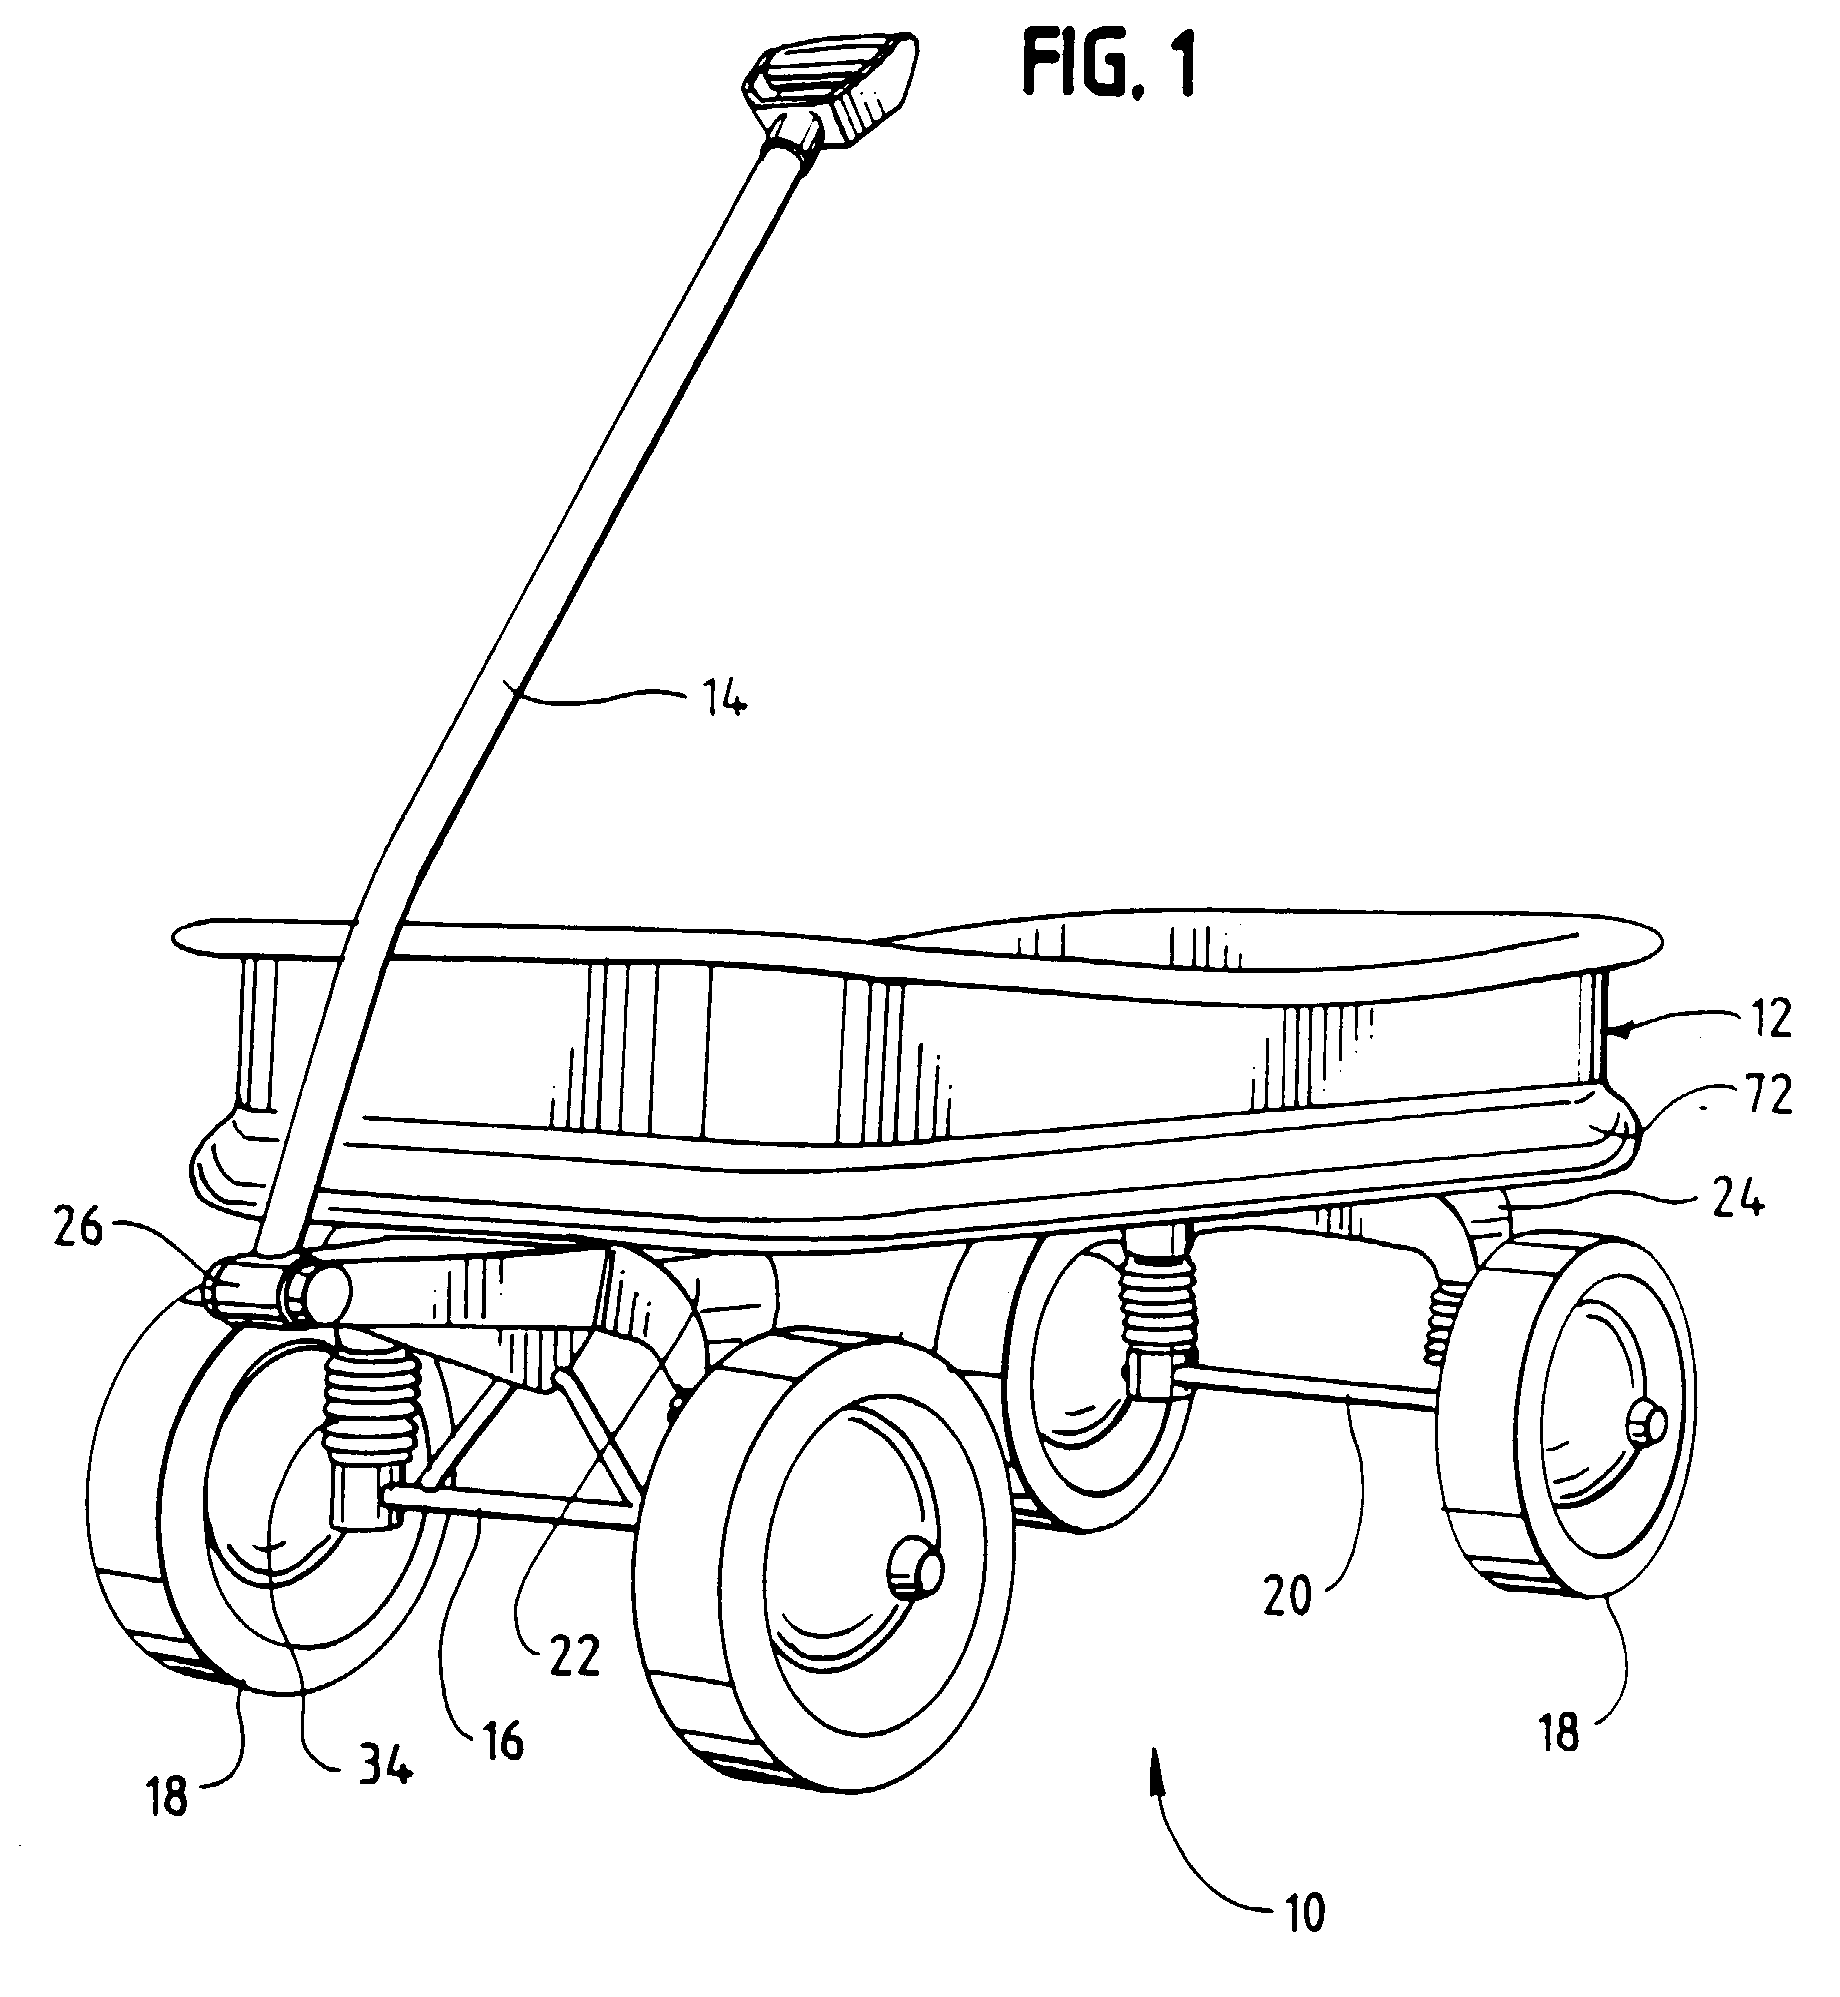 Radio Flyer Wagon Dimensions The Wagon